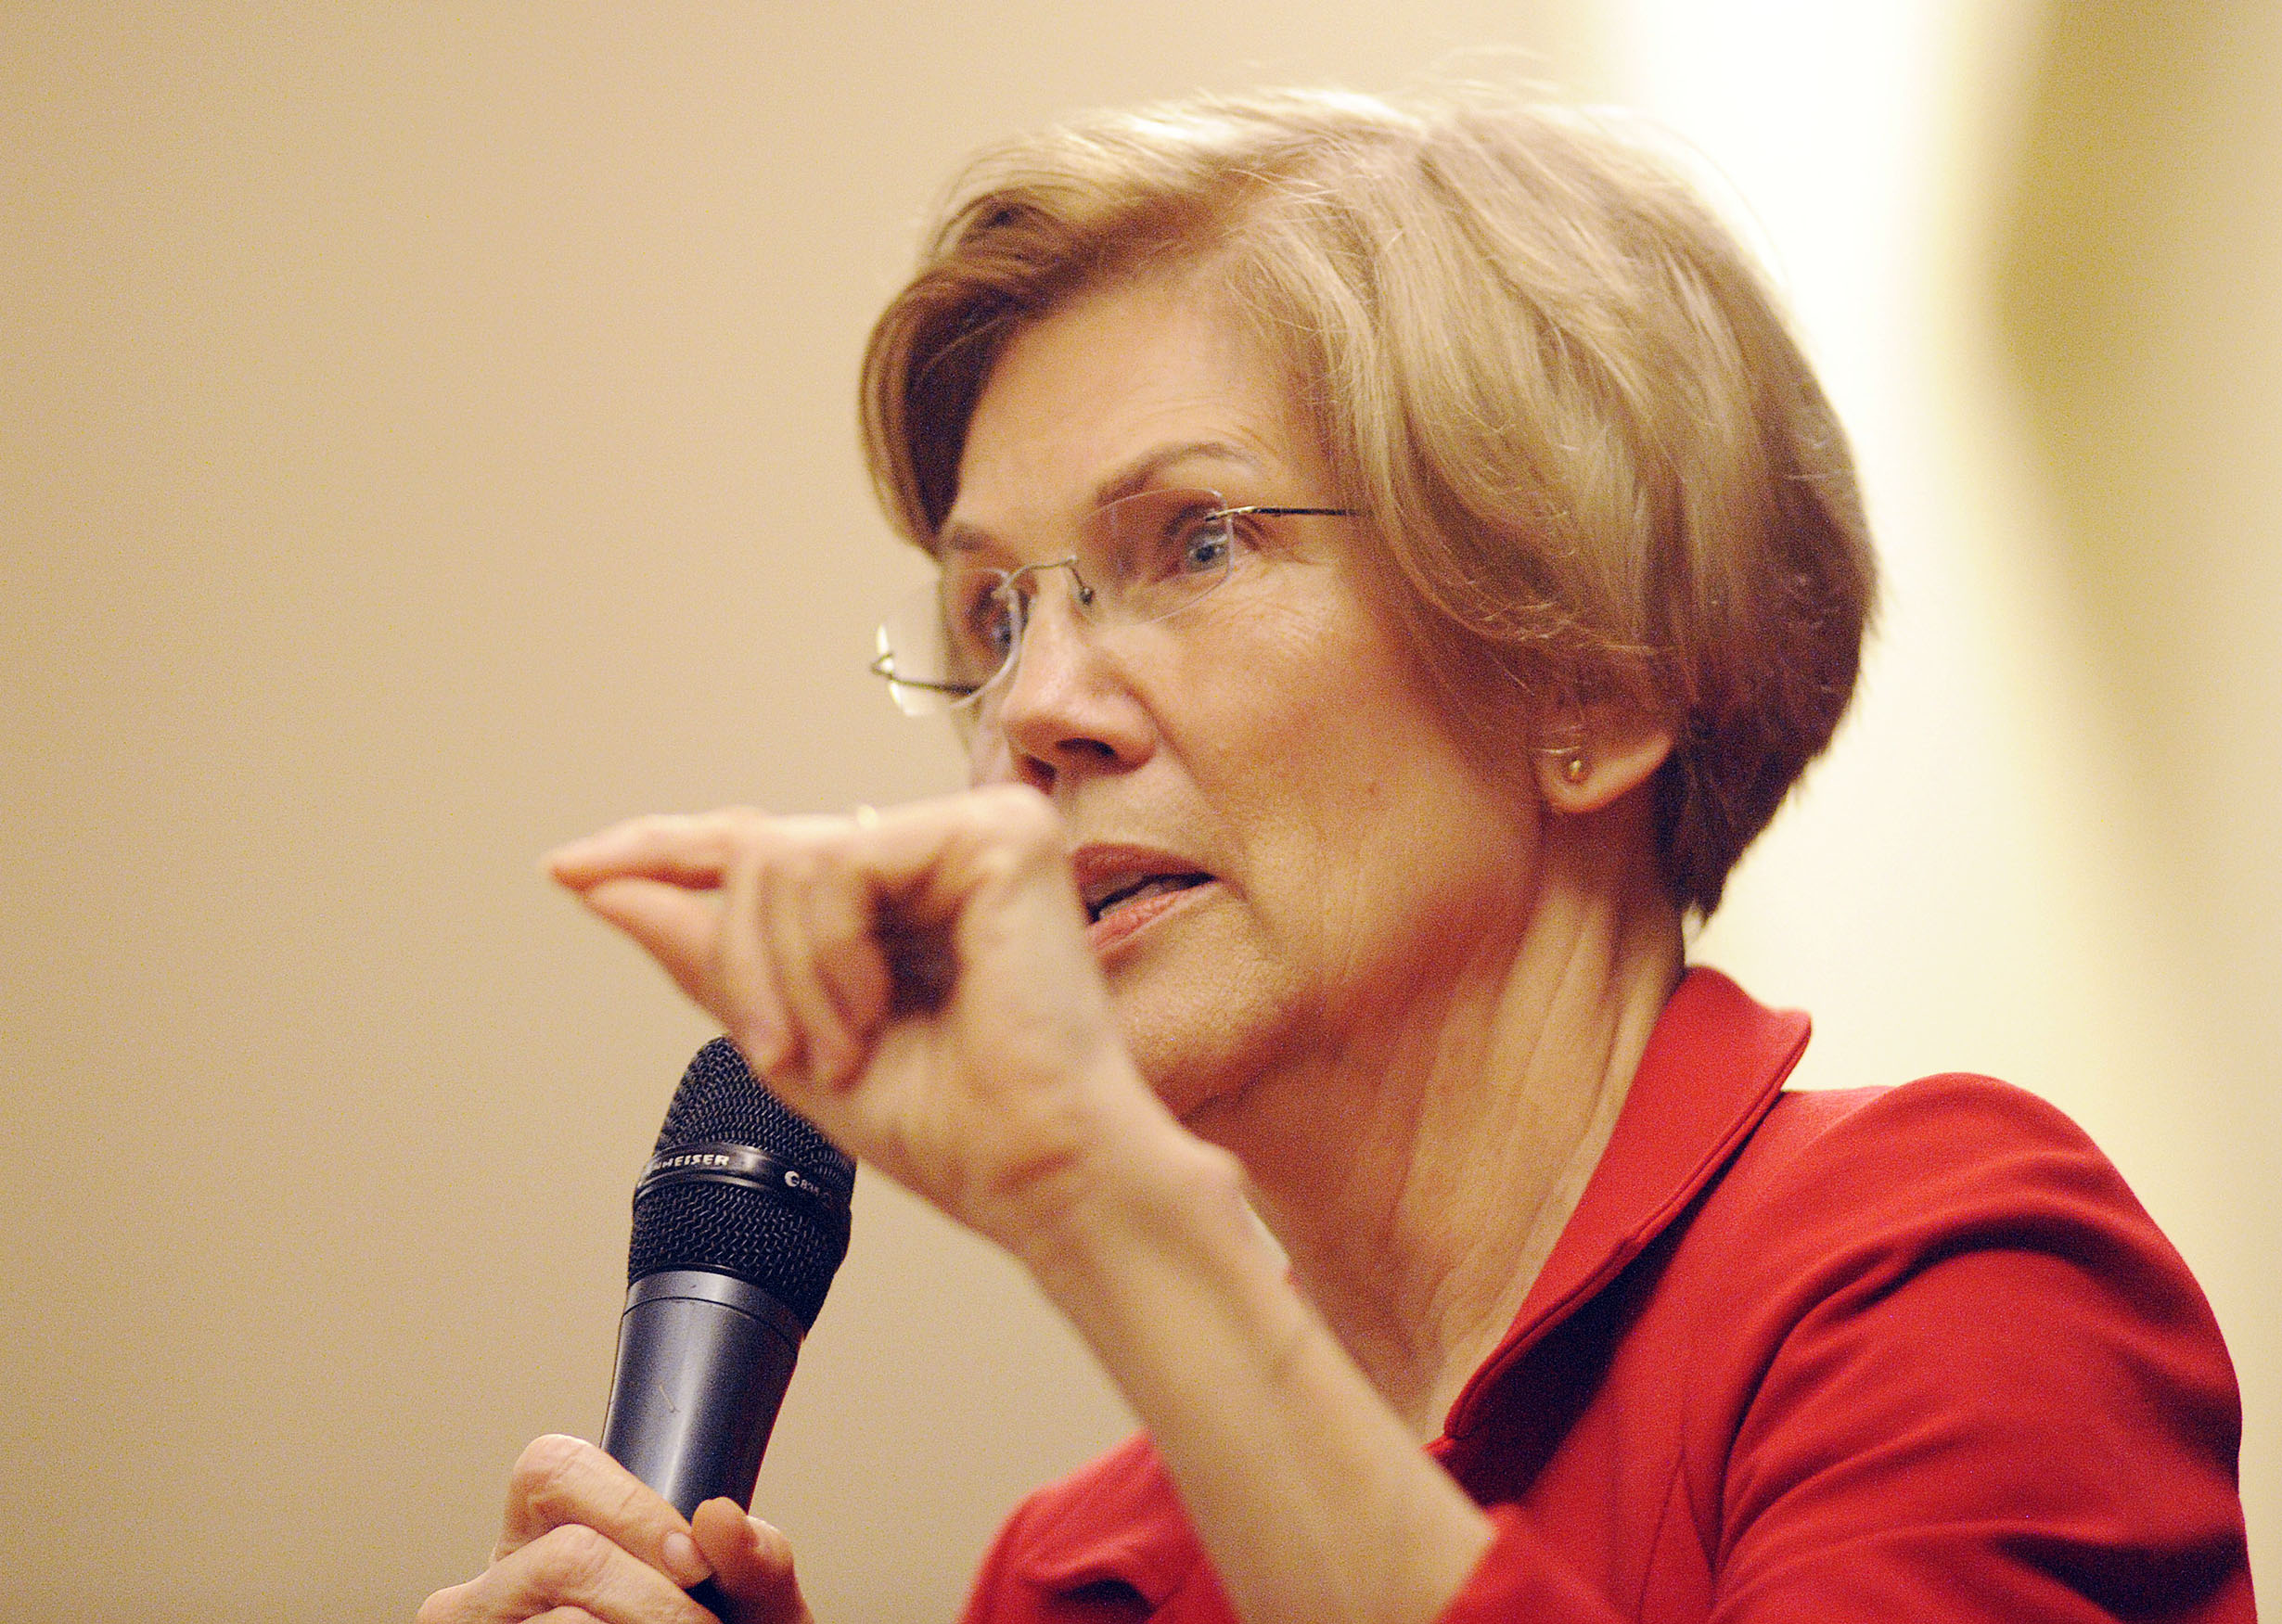 US Senator Elizabeth Warren (D-MA) addresses a town hall meeting in Roxbury, Massachusetts, October 13, 2018. (Photo JOSEPH PREZIOSO/AFP/Getty Images)